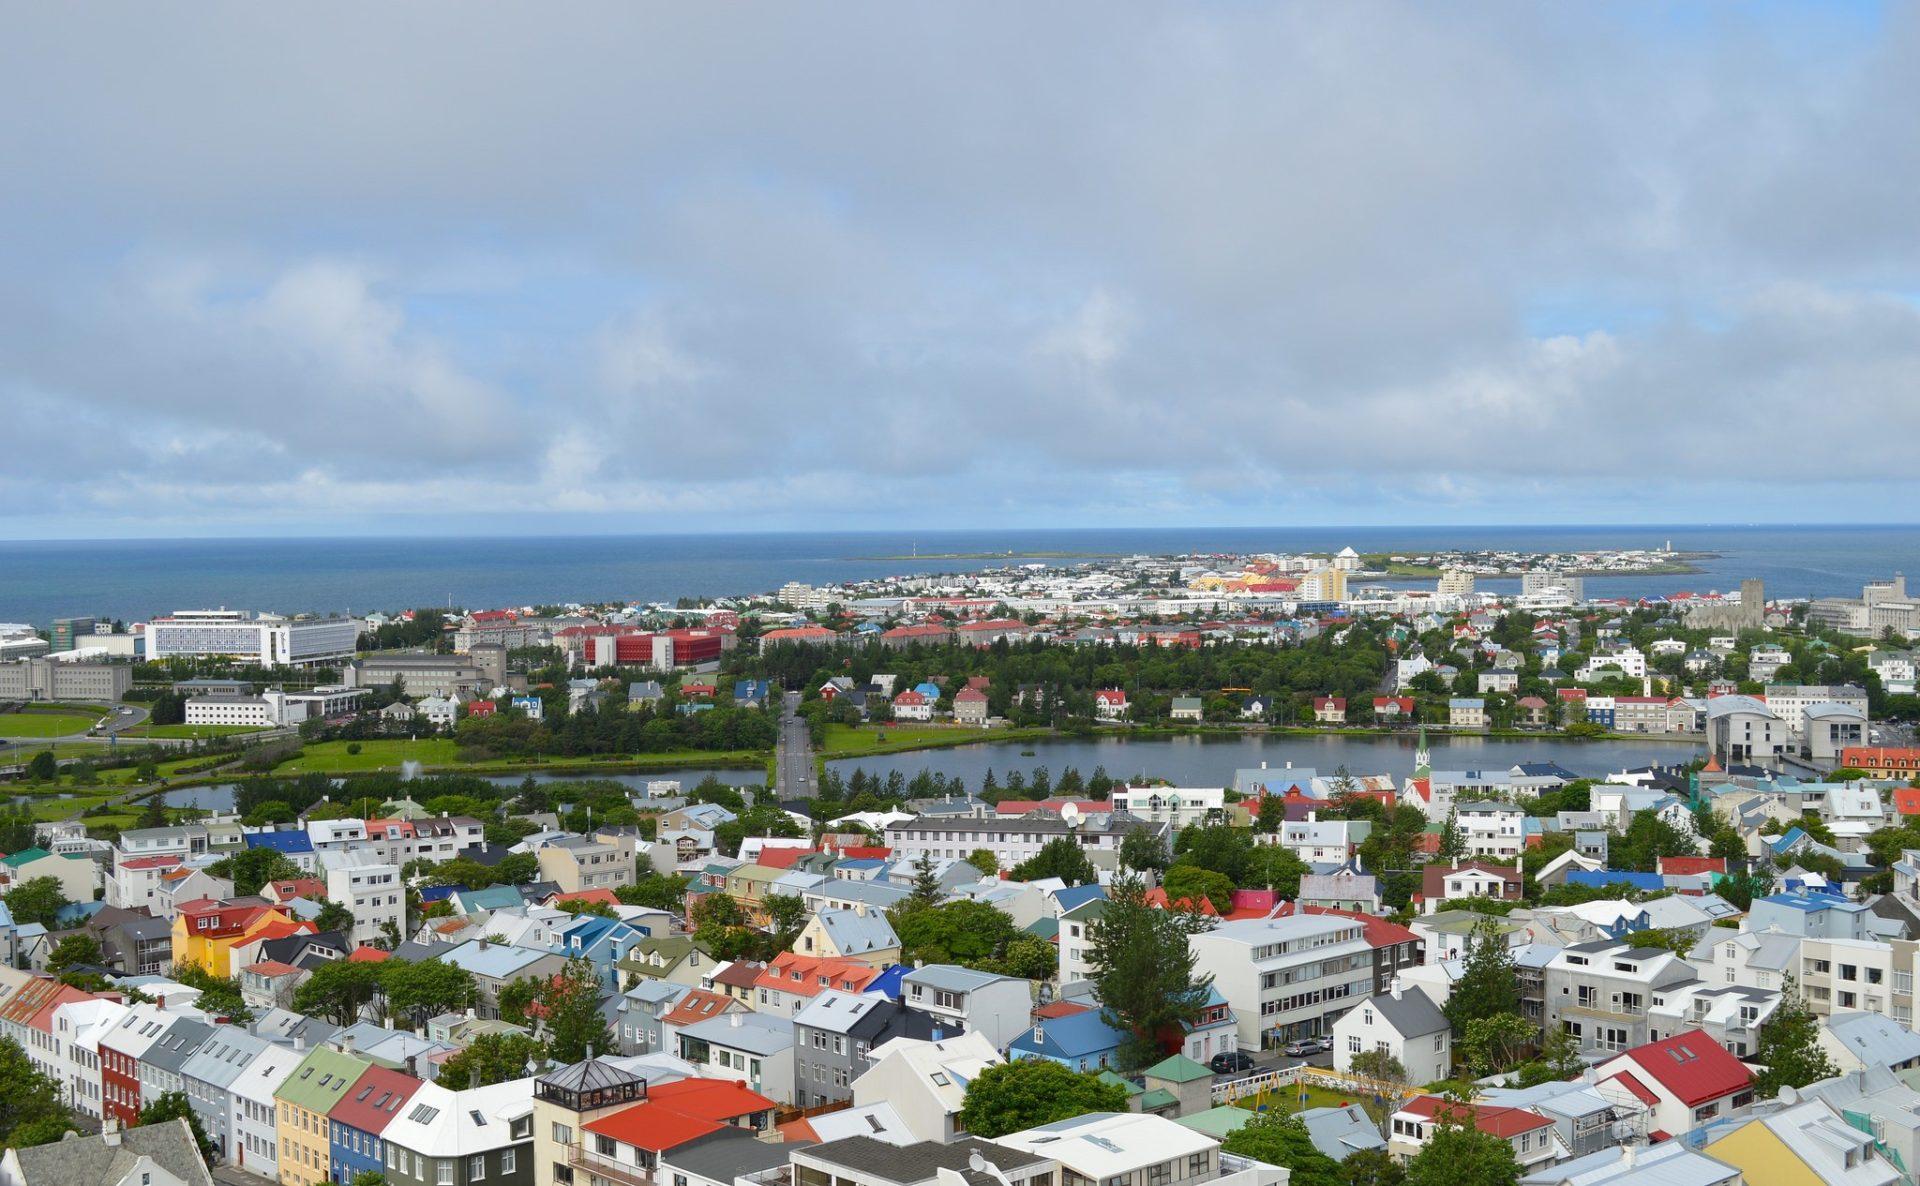 Reykjavik , Iceland. View from the top of Hallgrímskirkja. Photo by Philippa via Flickr CC